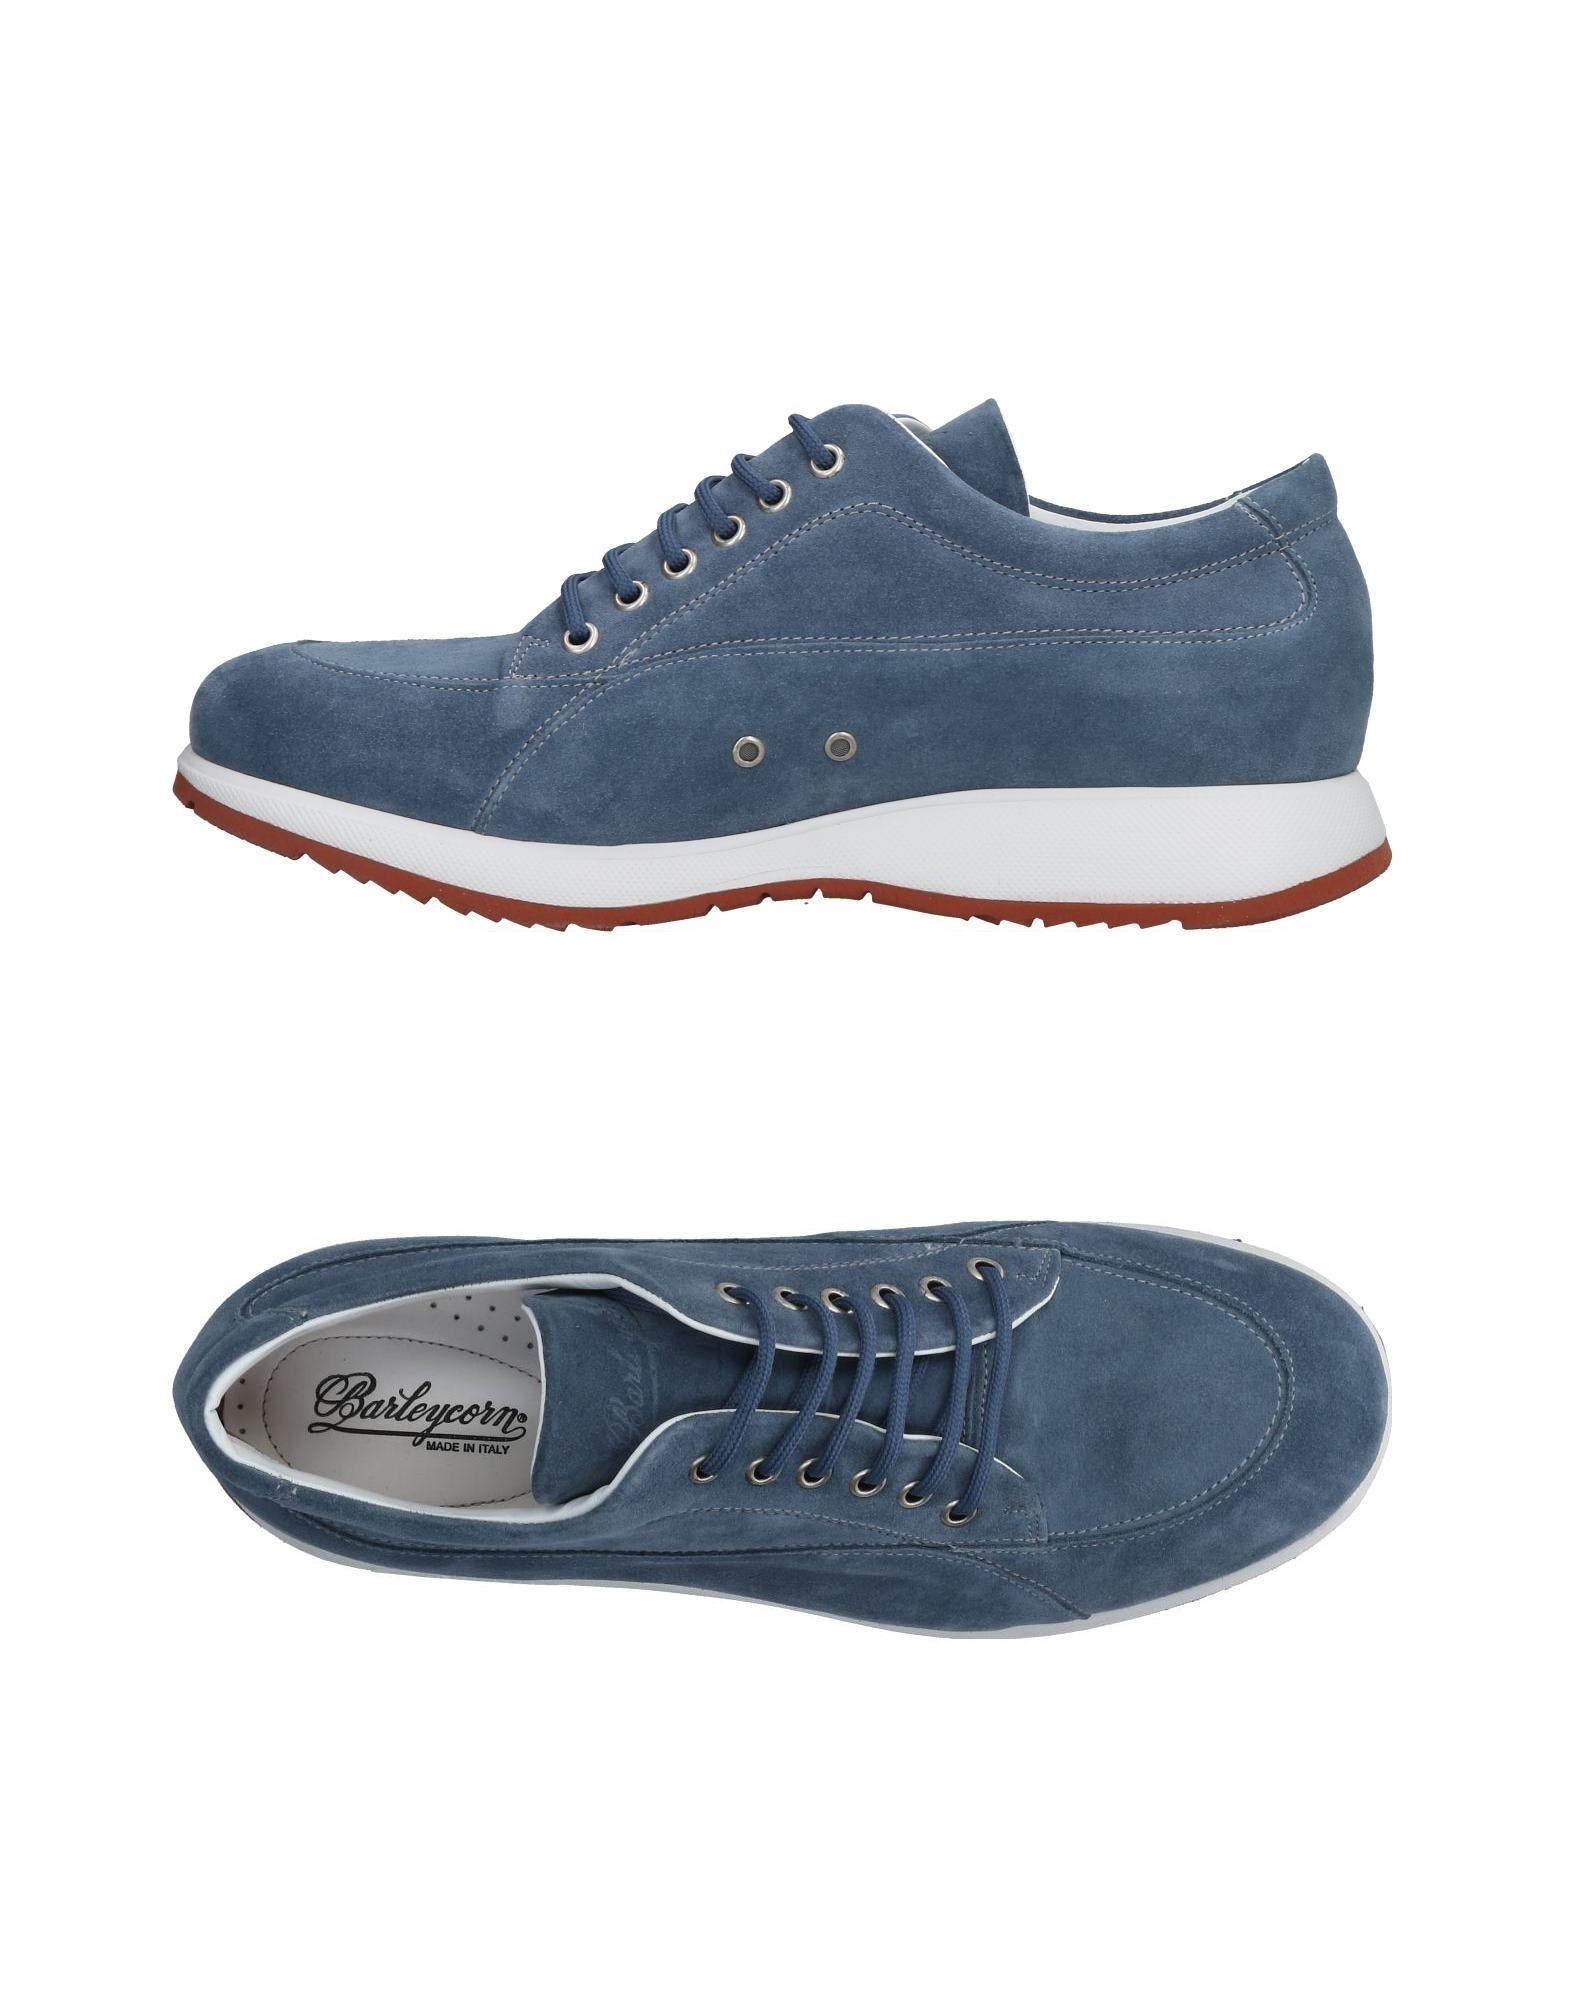 Moda Sneakers Barleycorn Uomo - - - 11467328MO e83f55